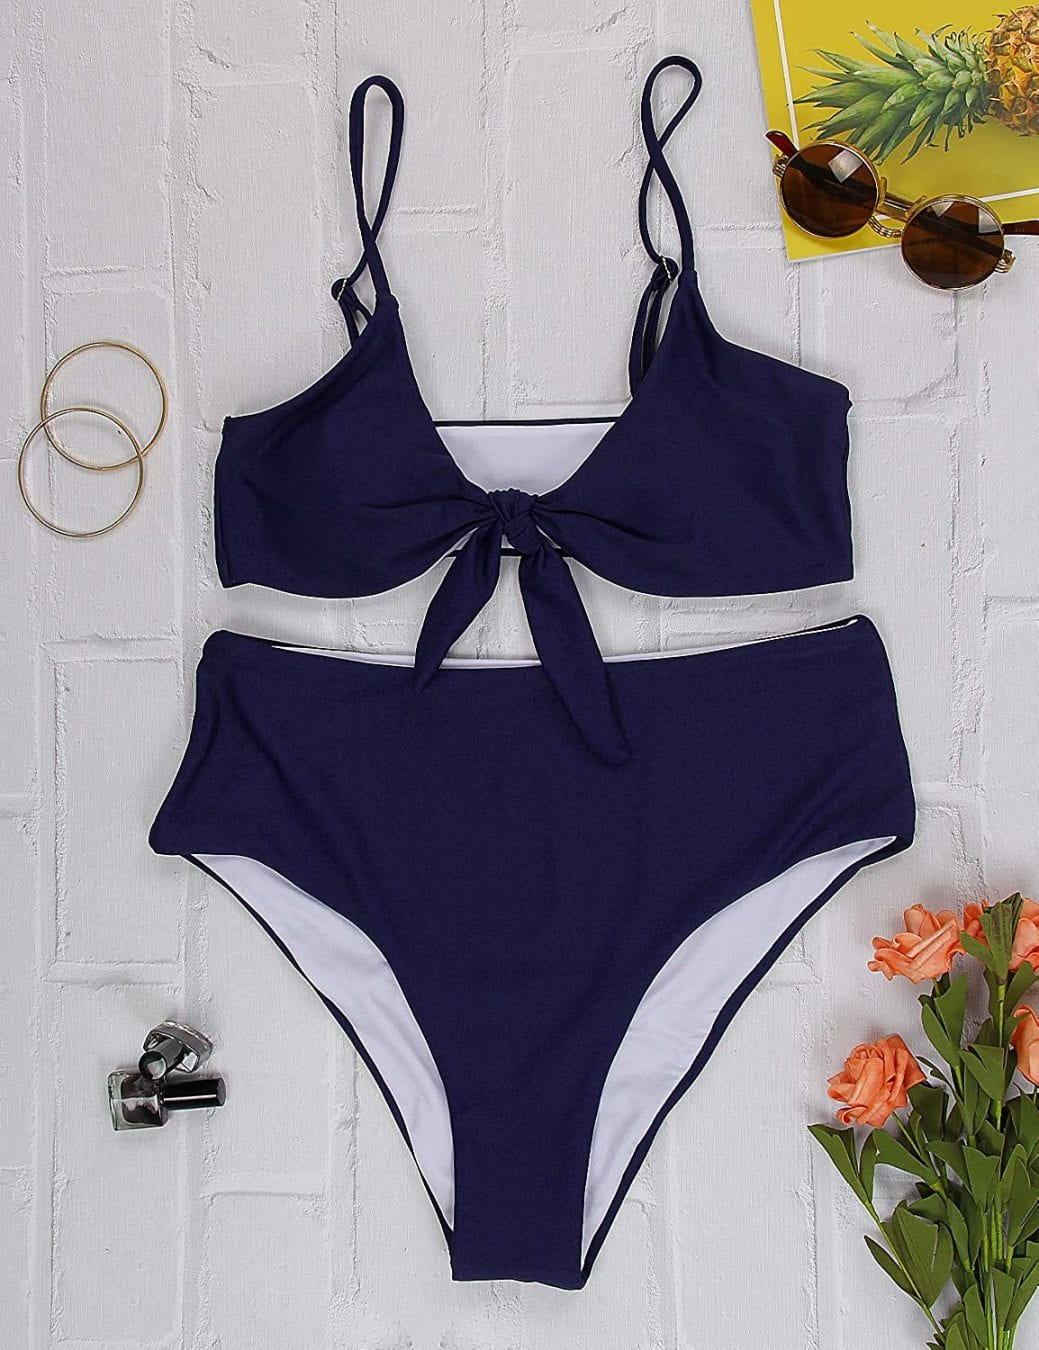 Cute navy bikini with over 5000 reviews on Amazon